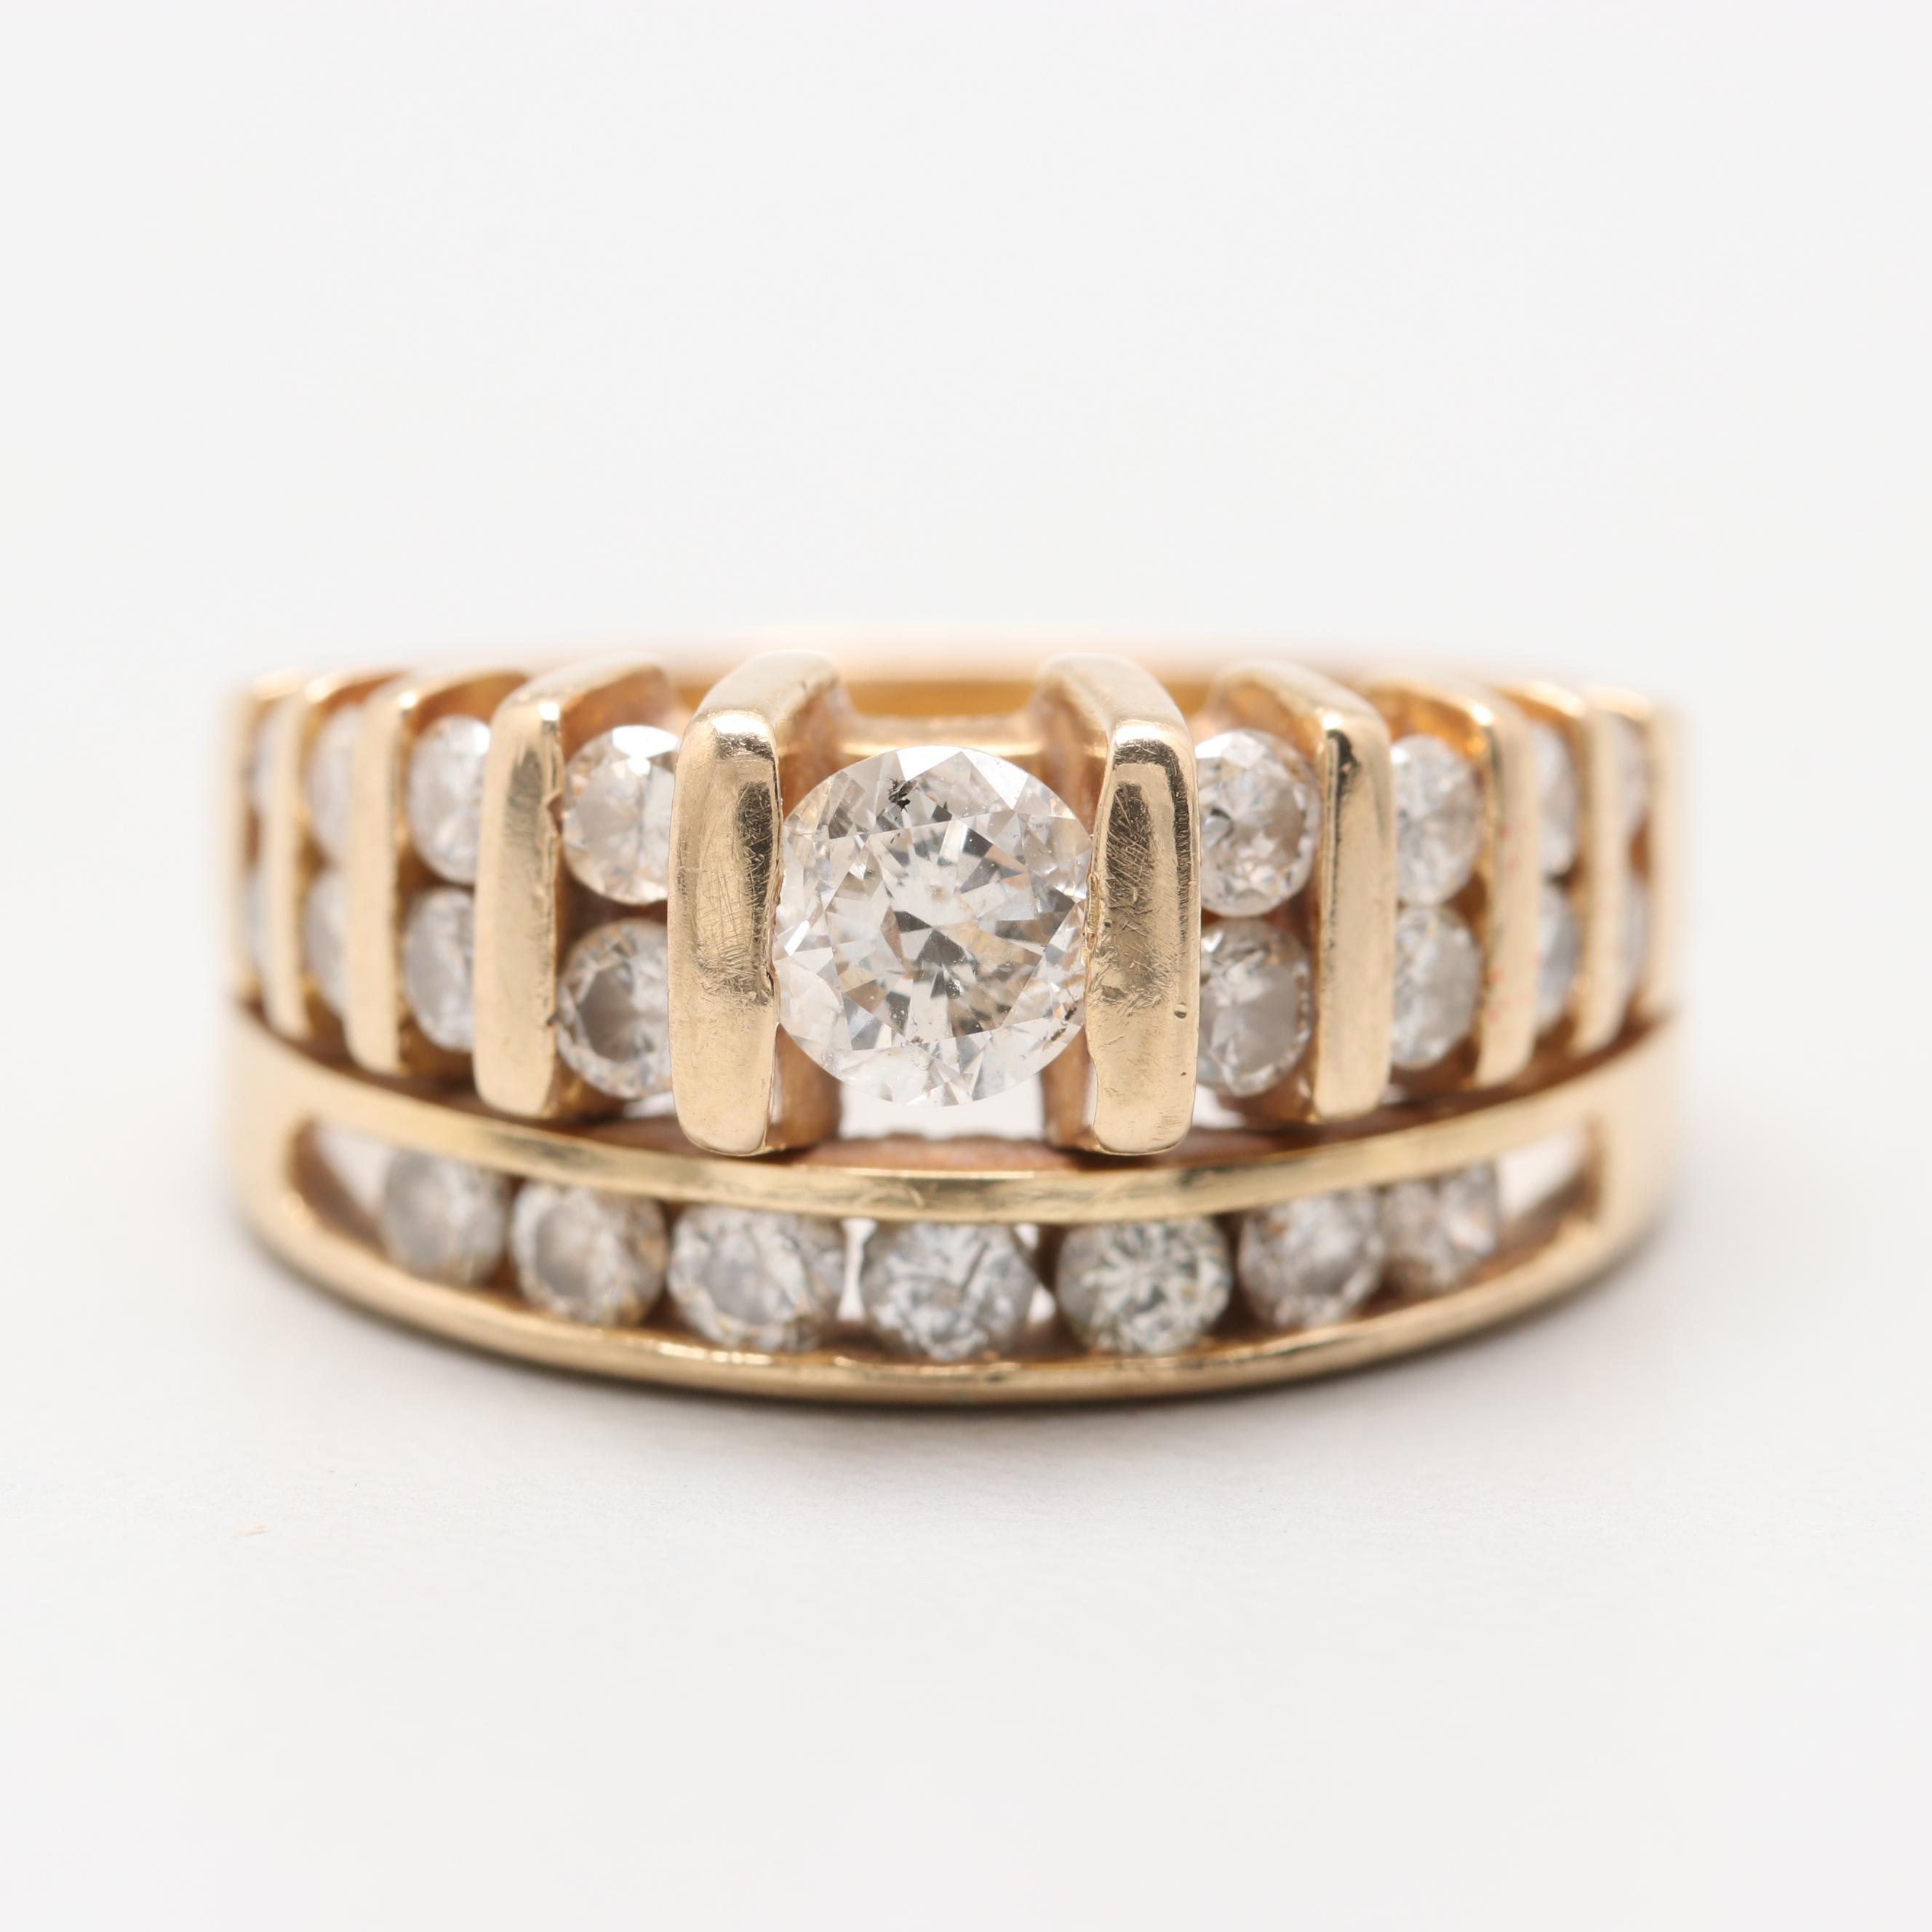 14K Yellow Gold 1.13 CTW Diamond Ring